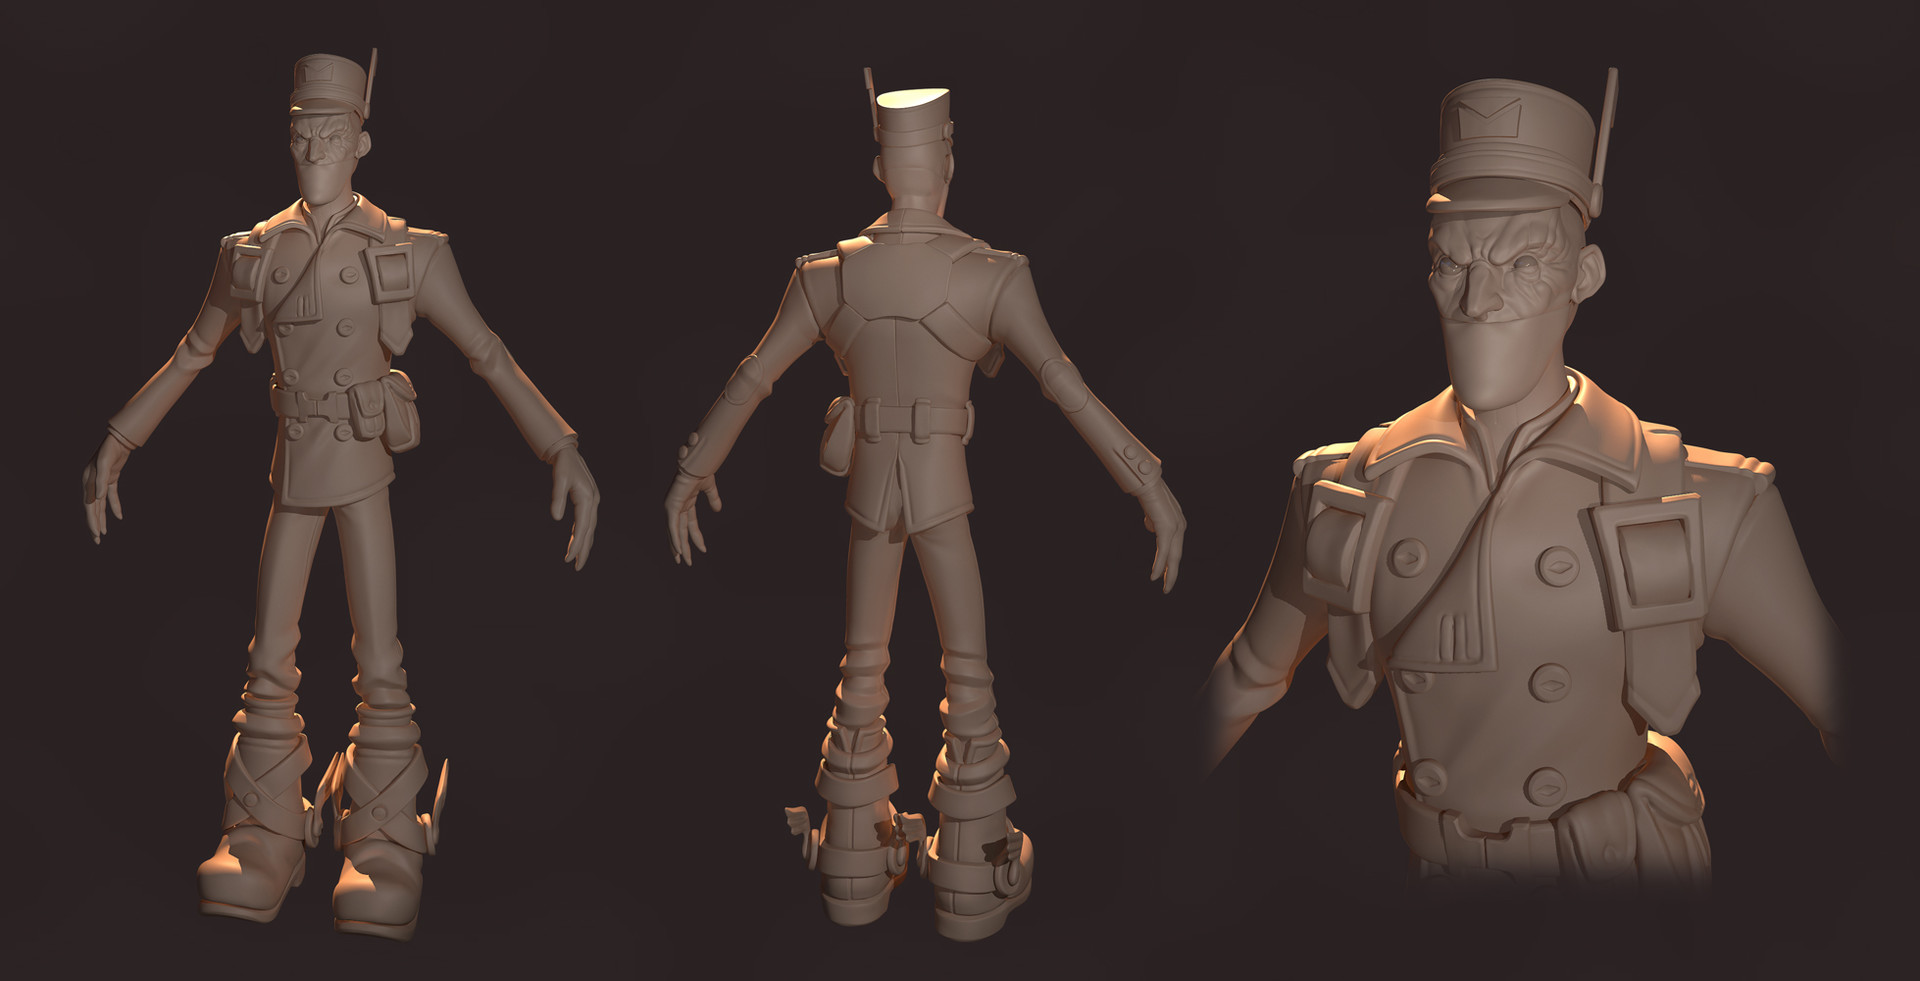 Patrick grant sculptrender